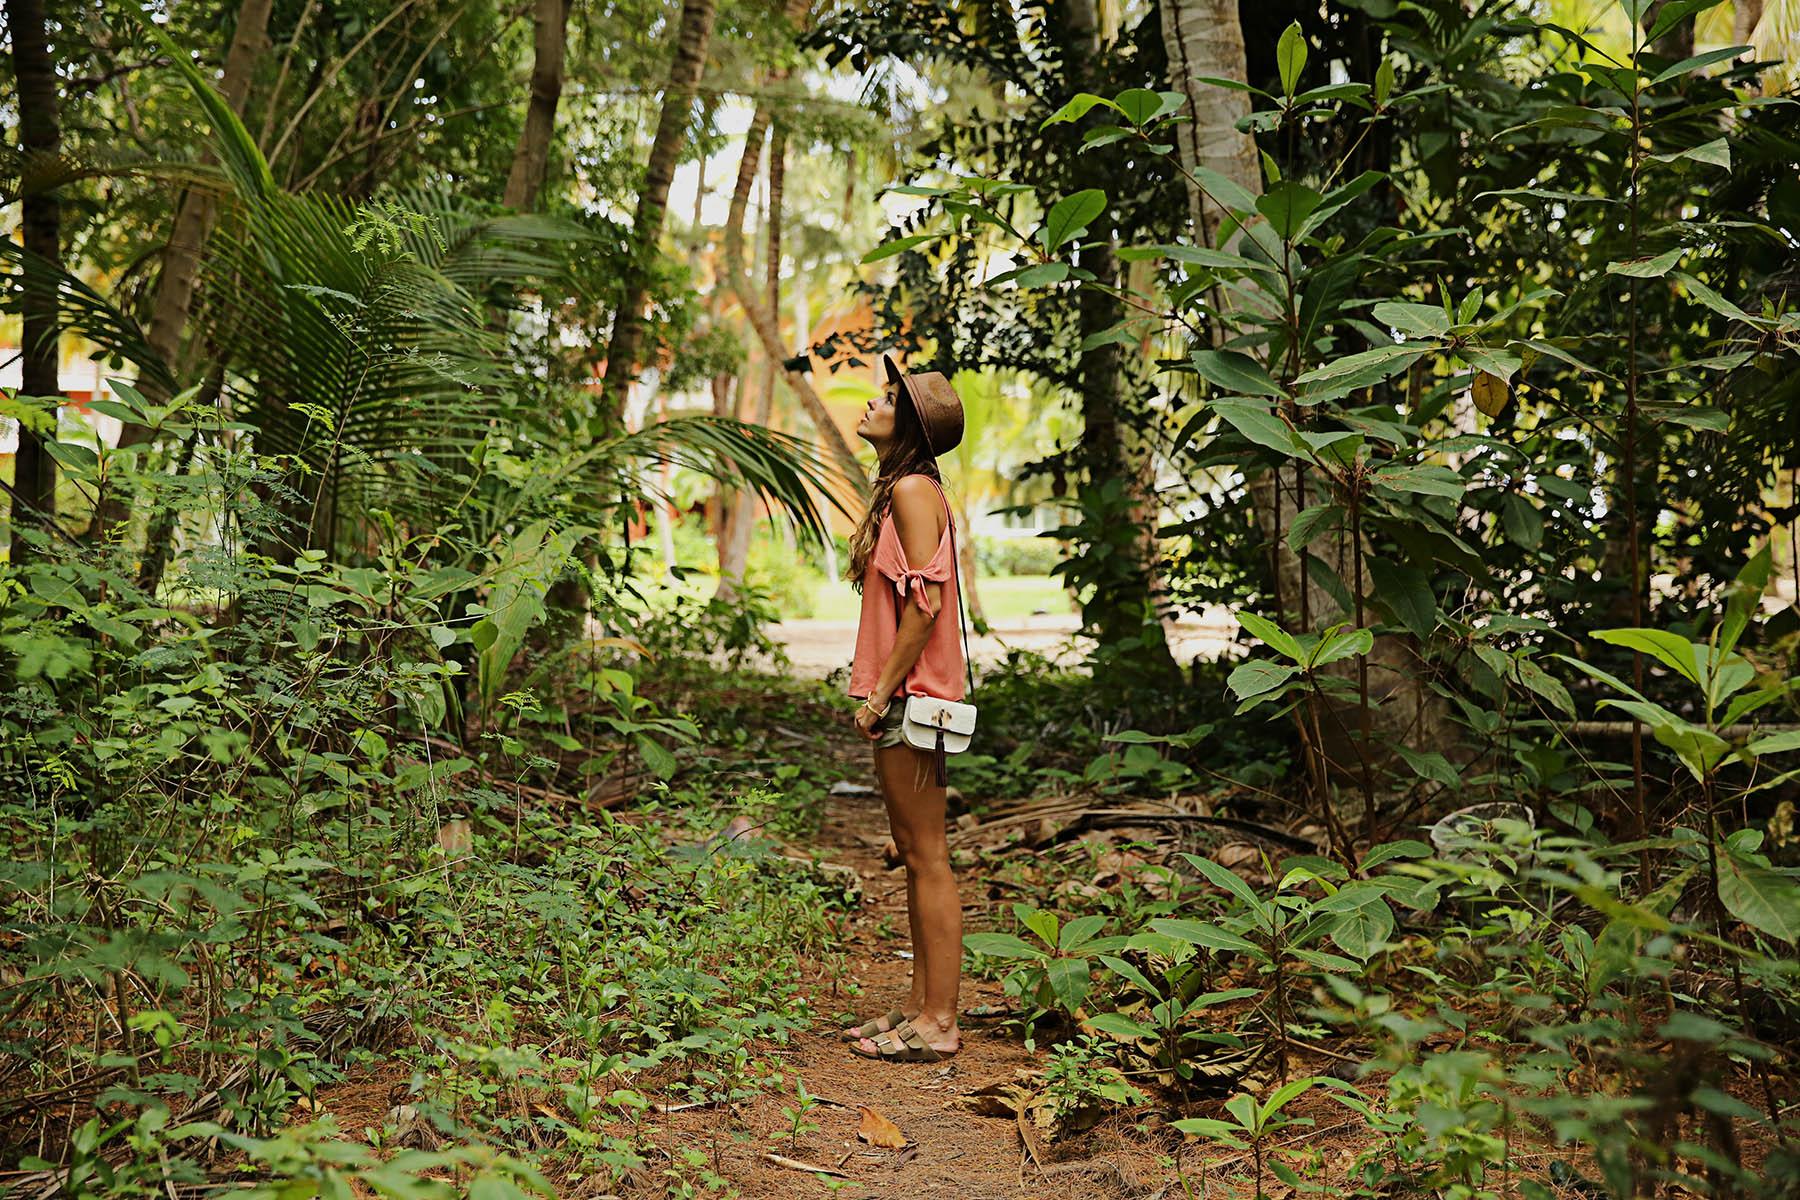 trendy-taste-look-outfit-street-style-ootd-blog-blogger-fashion-spain-moda-españa-boho-hippie-verano-birkenstock-bavaro-barcelo-khaki-caqui-shorts-sombrero-top-6